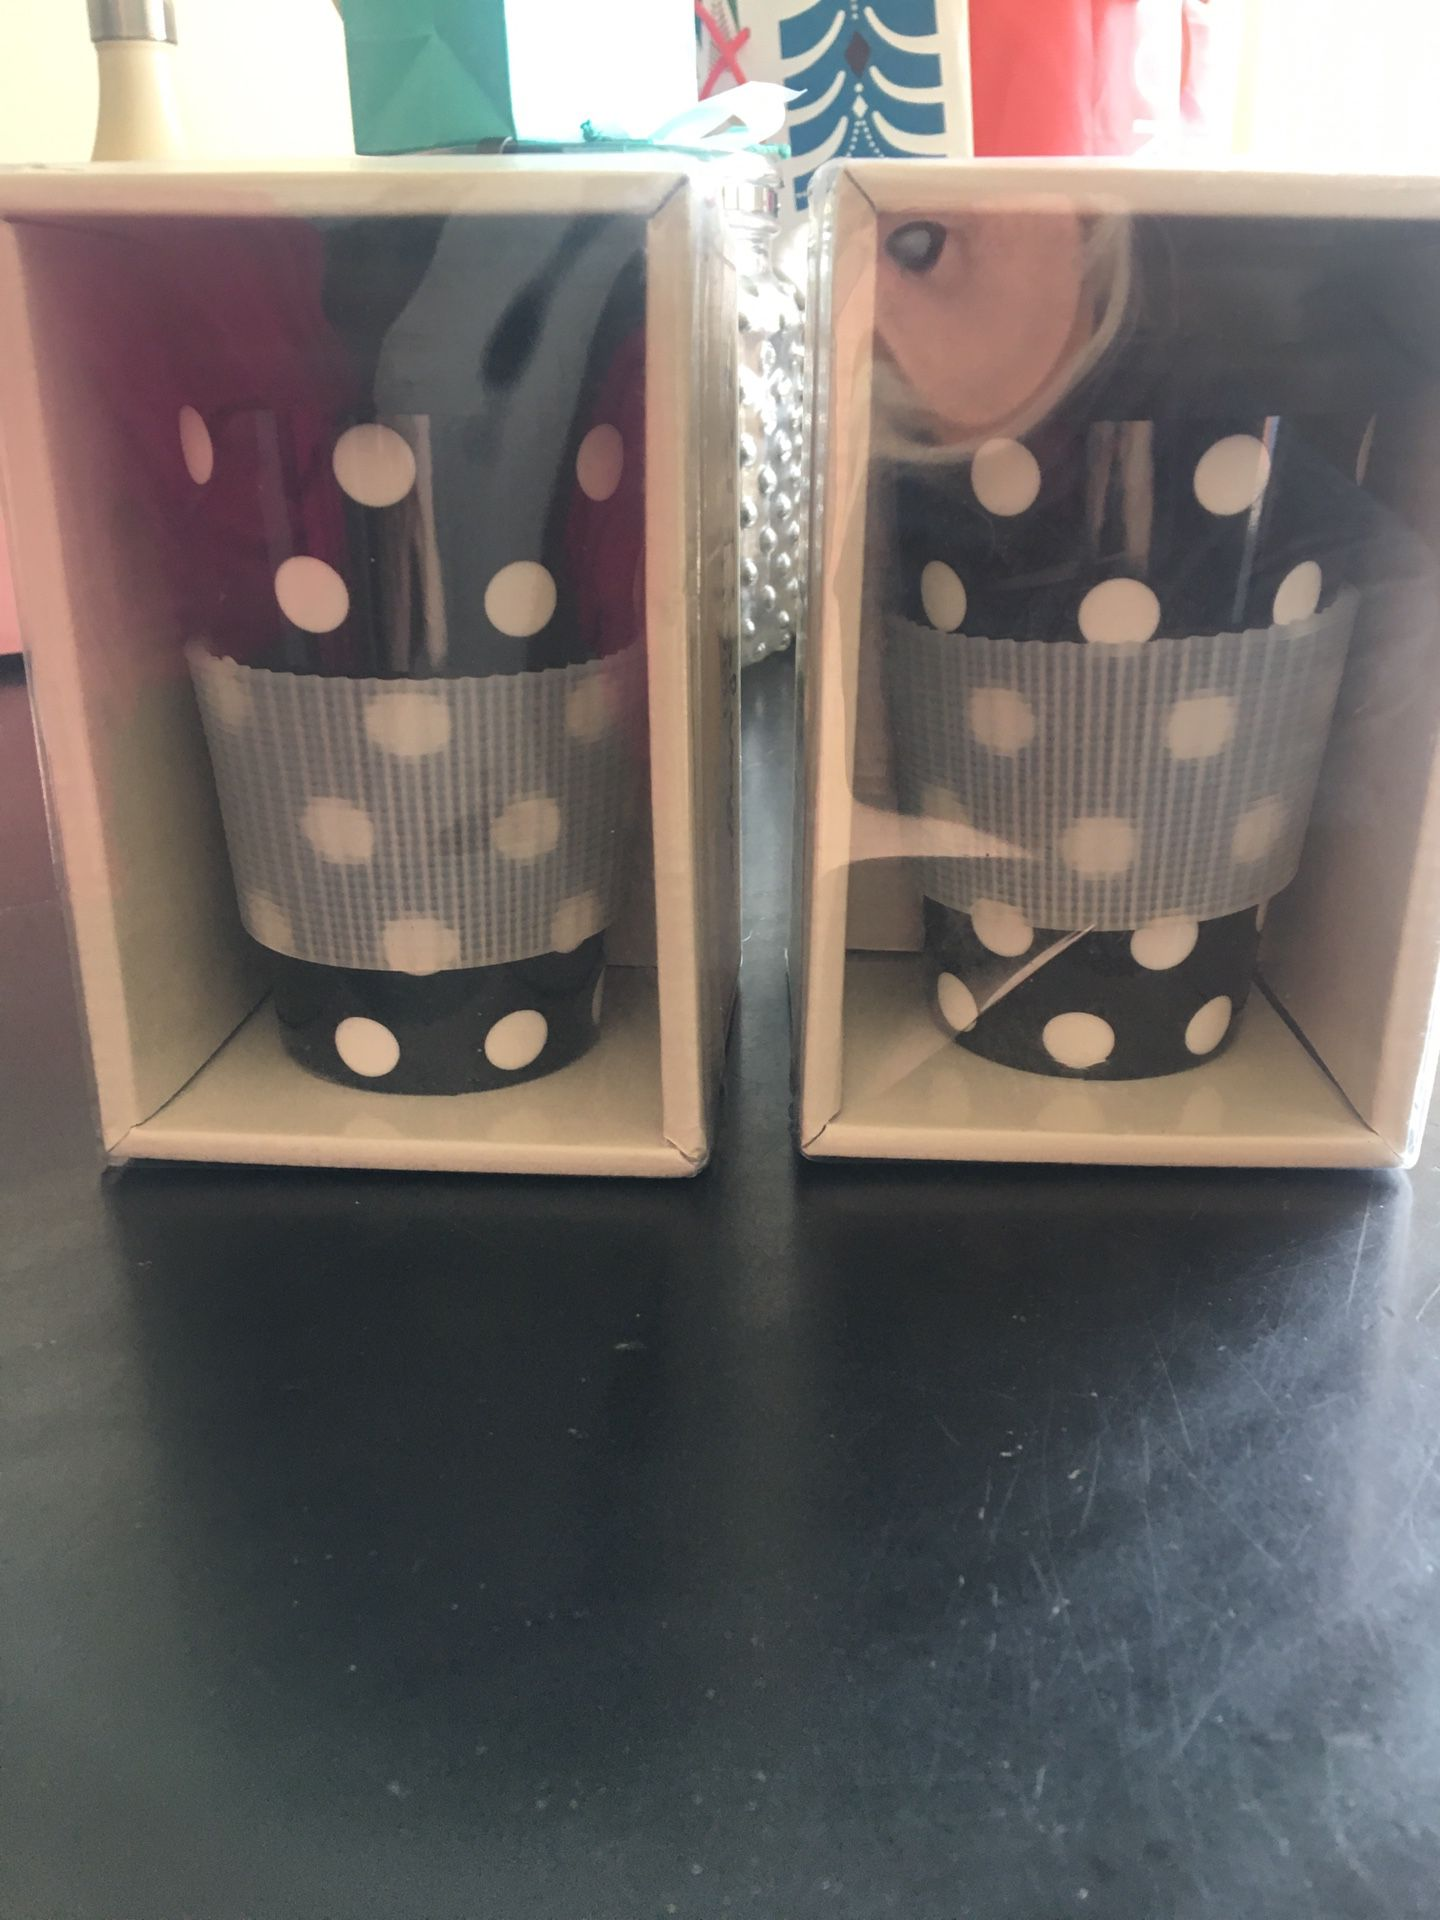 2 coffee or tea mugs